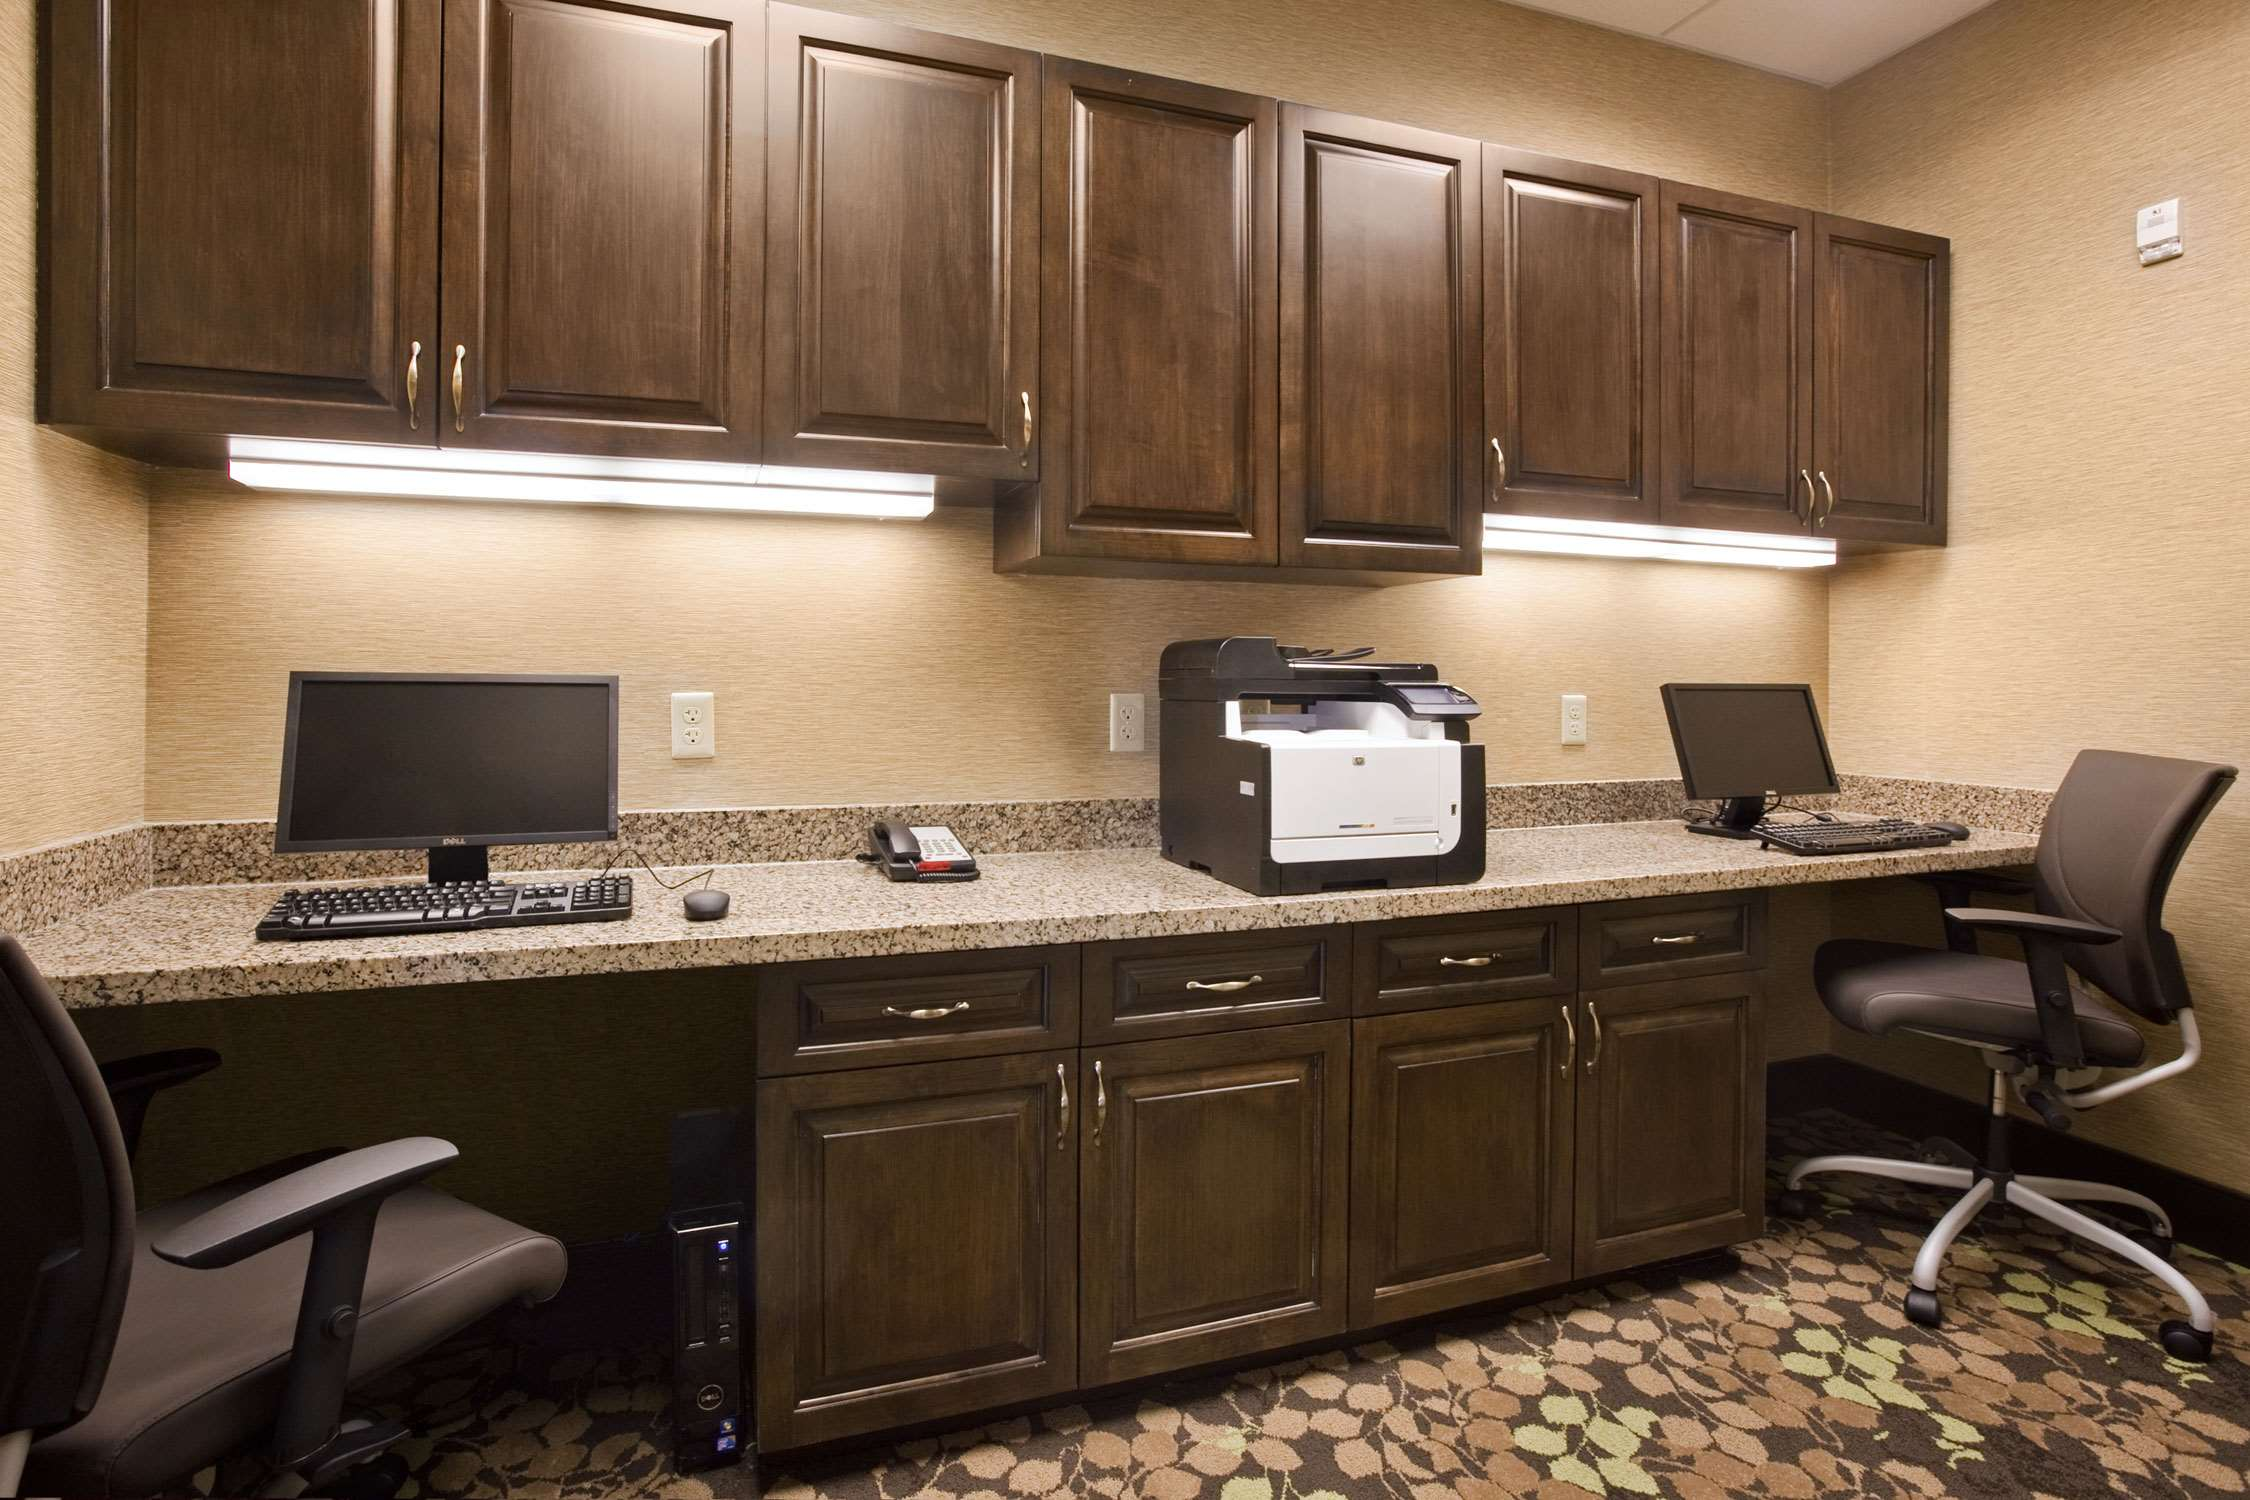 Homewood Suites by Hilton Charlotte/Ayrsley, NC image 17